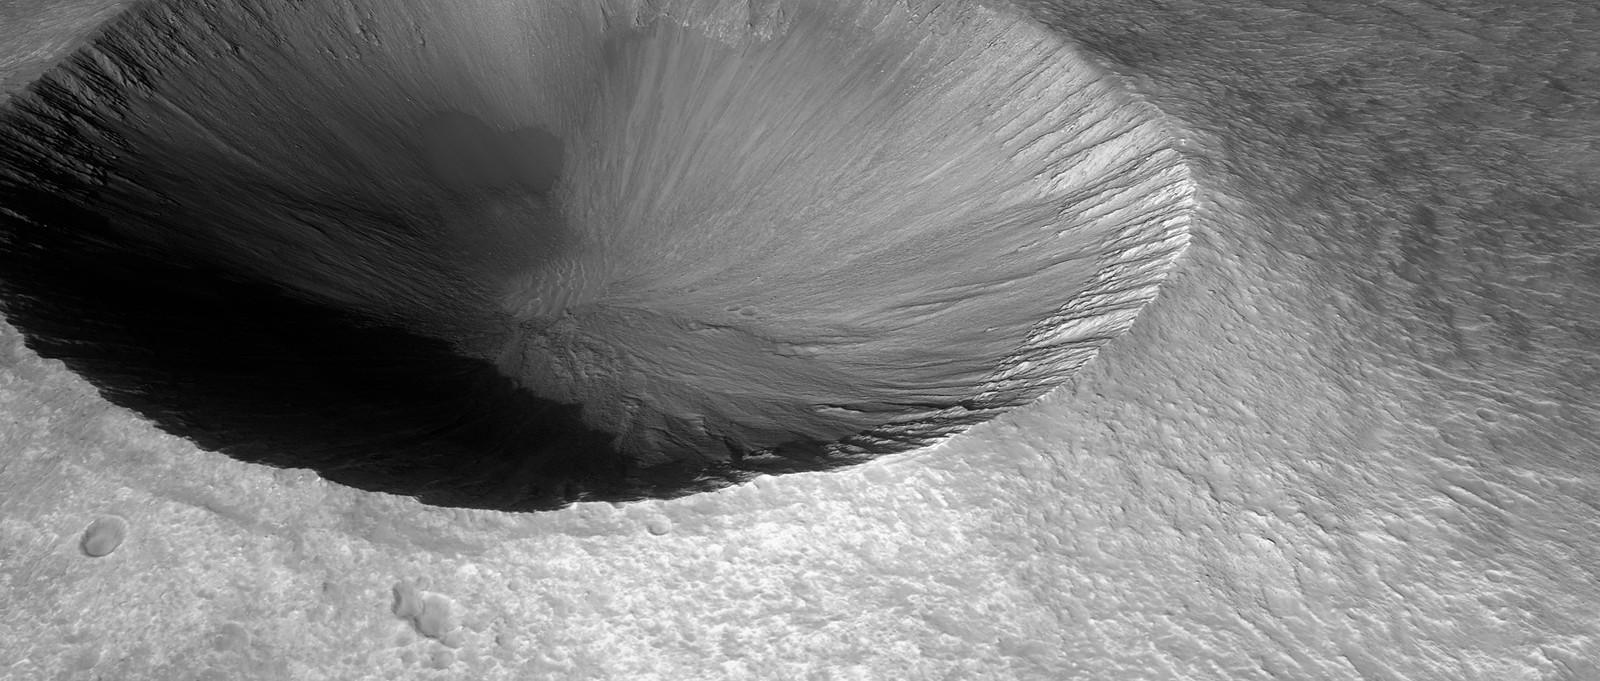 MARS DEM